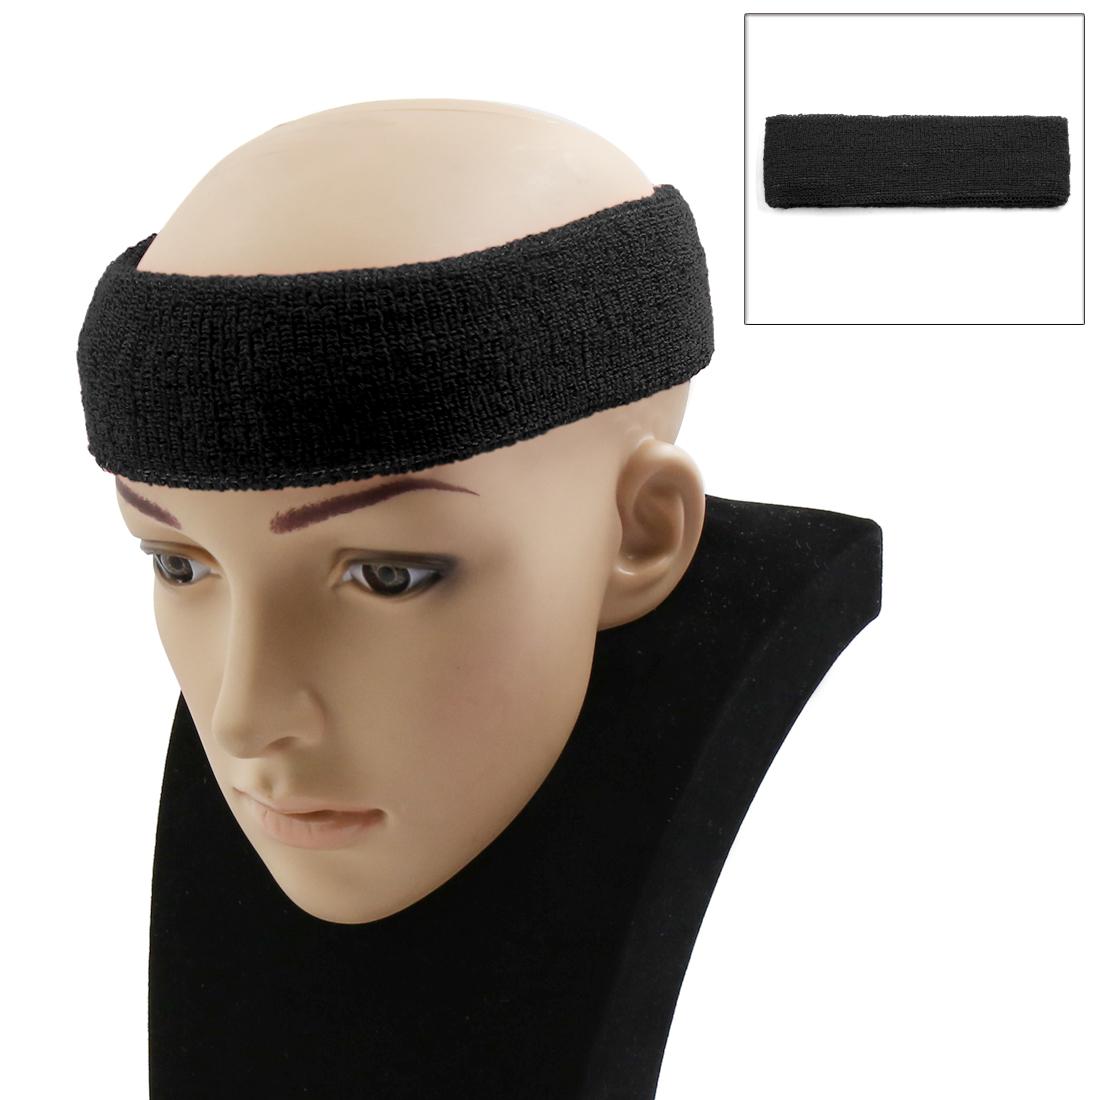 Black Basketball Sports Headband Exercise Yoga Sweatband Elastic Stretch Head Wrap Protector Turban